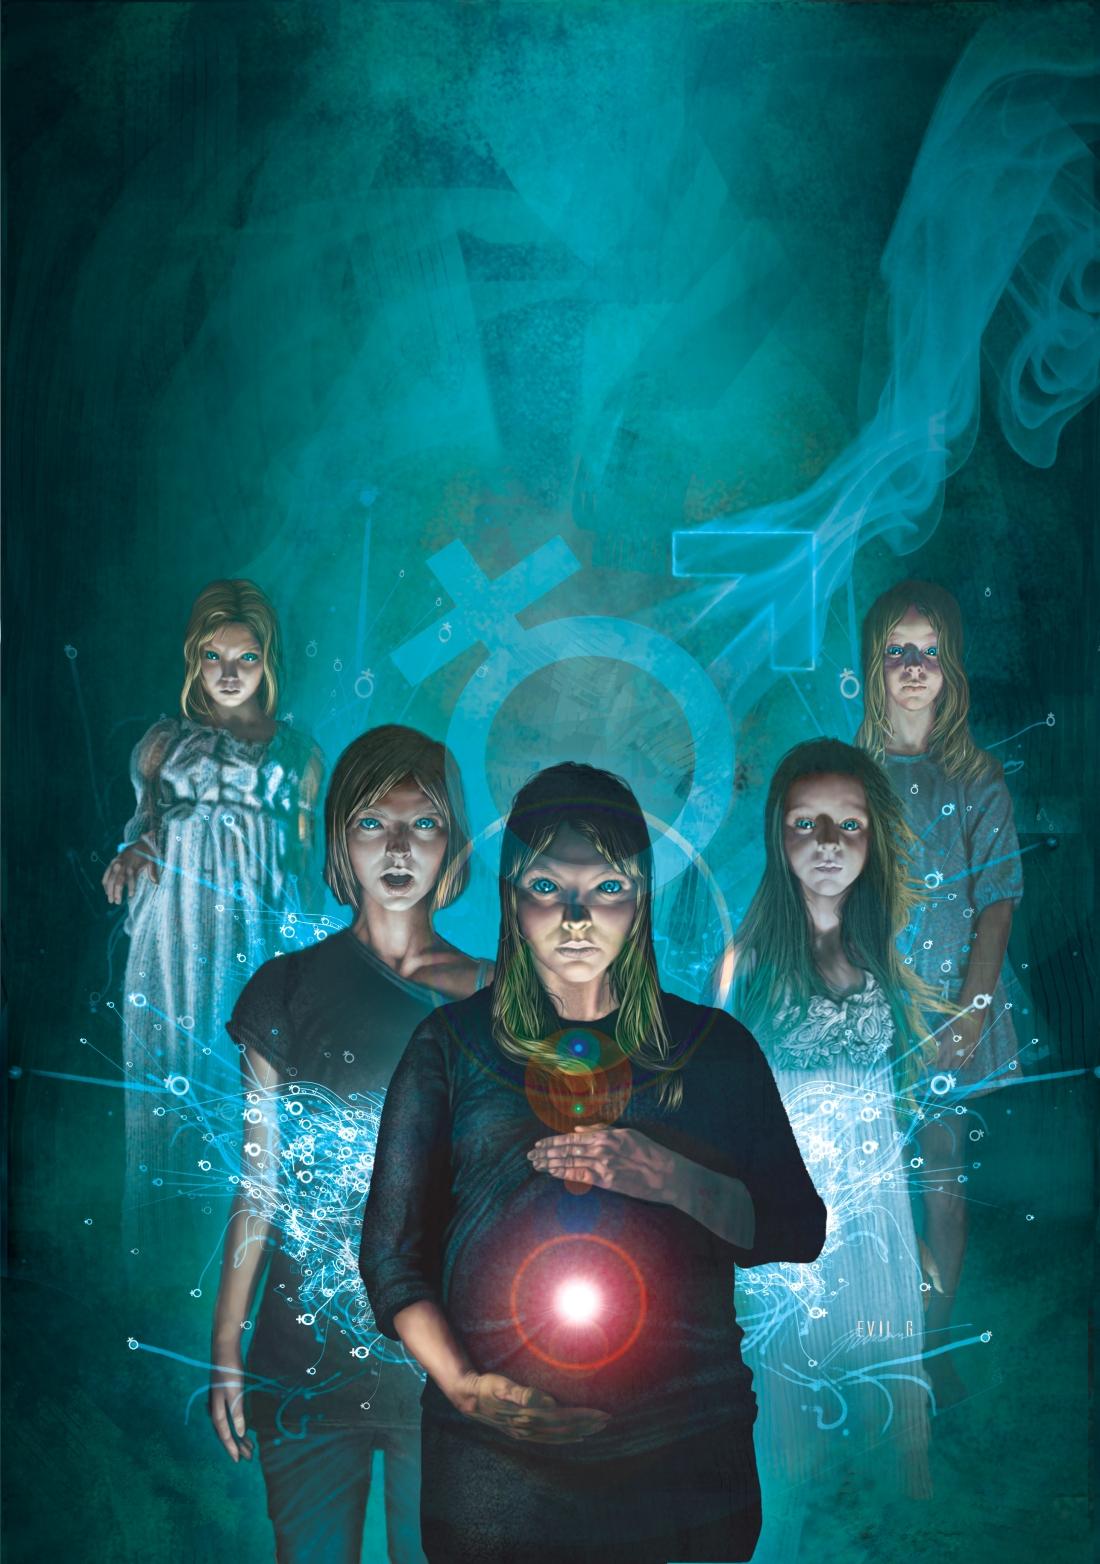 Gary_Freeman_Illustration_Publishing_Sci-Fi_Asimovs_Cover